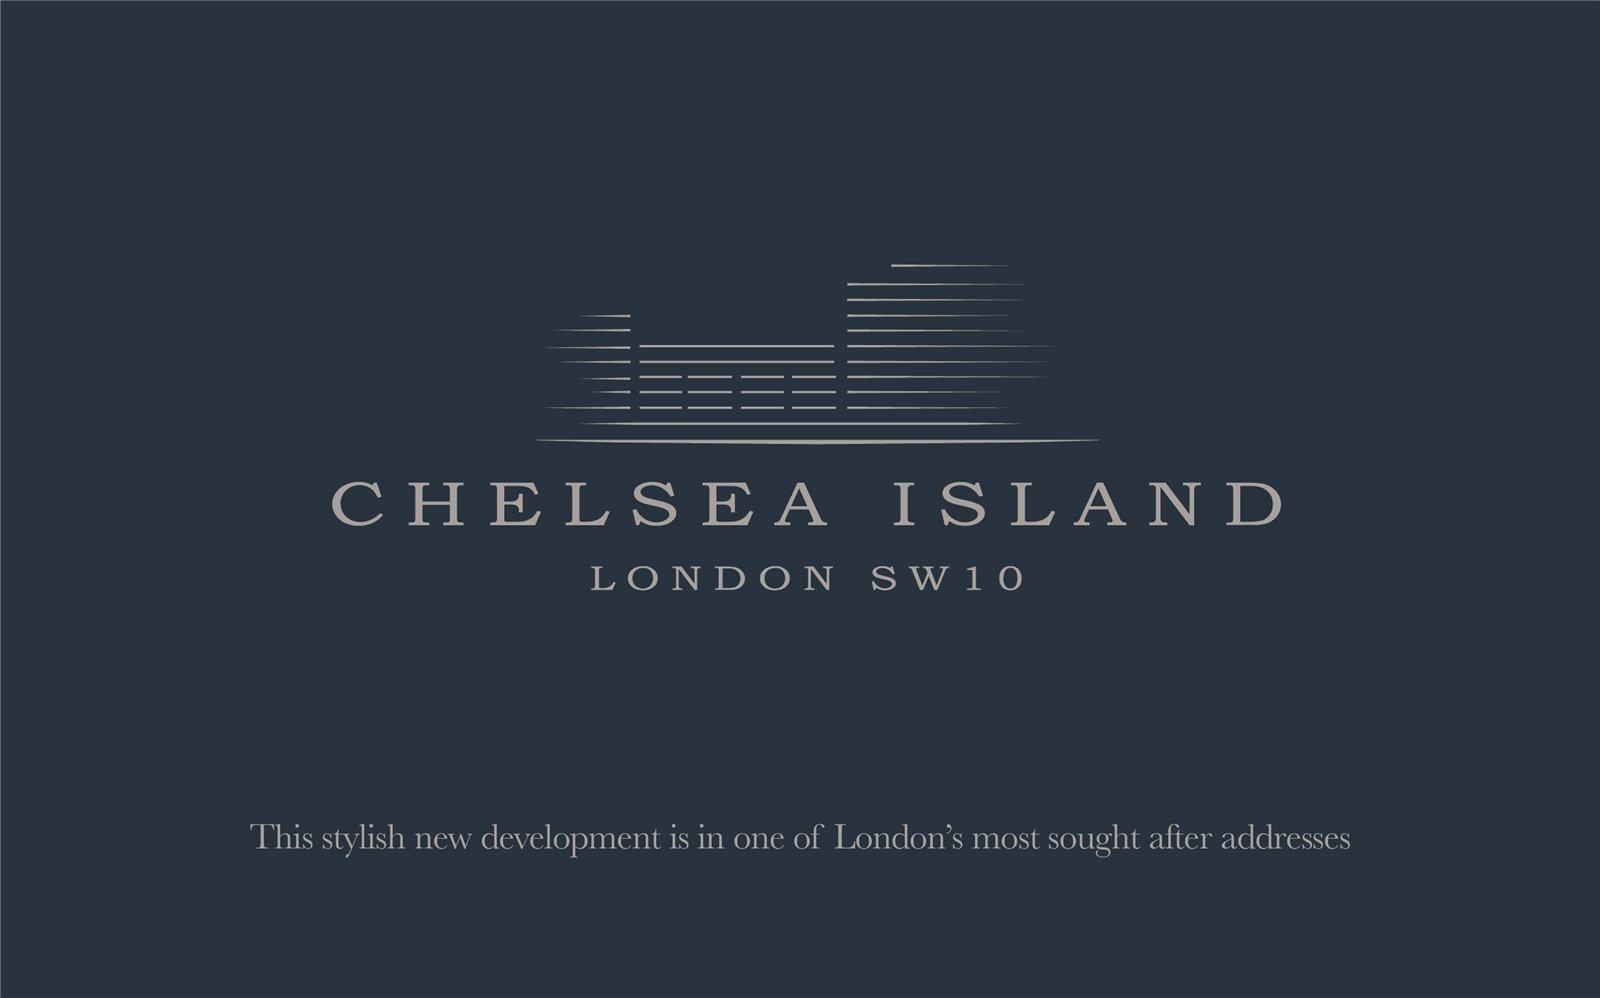 Chelsea Island